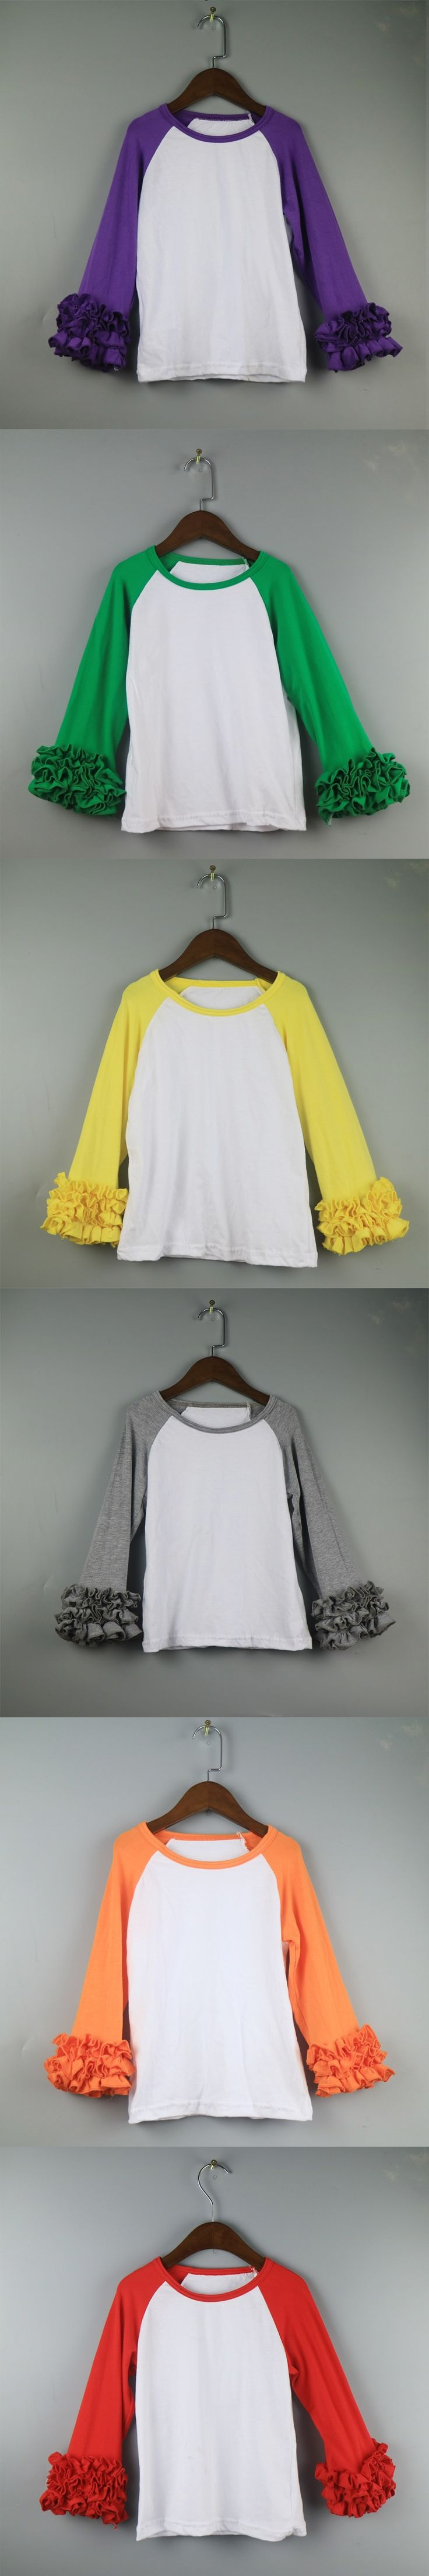 Easter Day's shirts Rabit tunic icing t shirts for girls  wholesale baseball girl yellow ruffle t-shirts for children